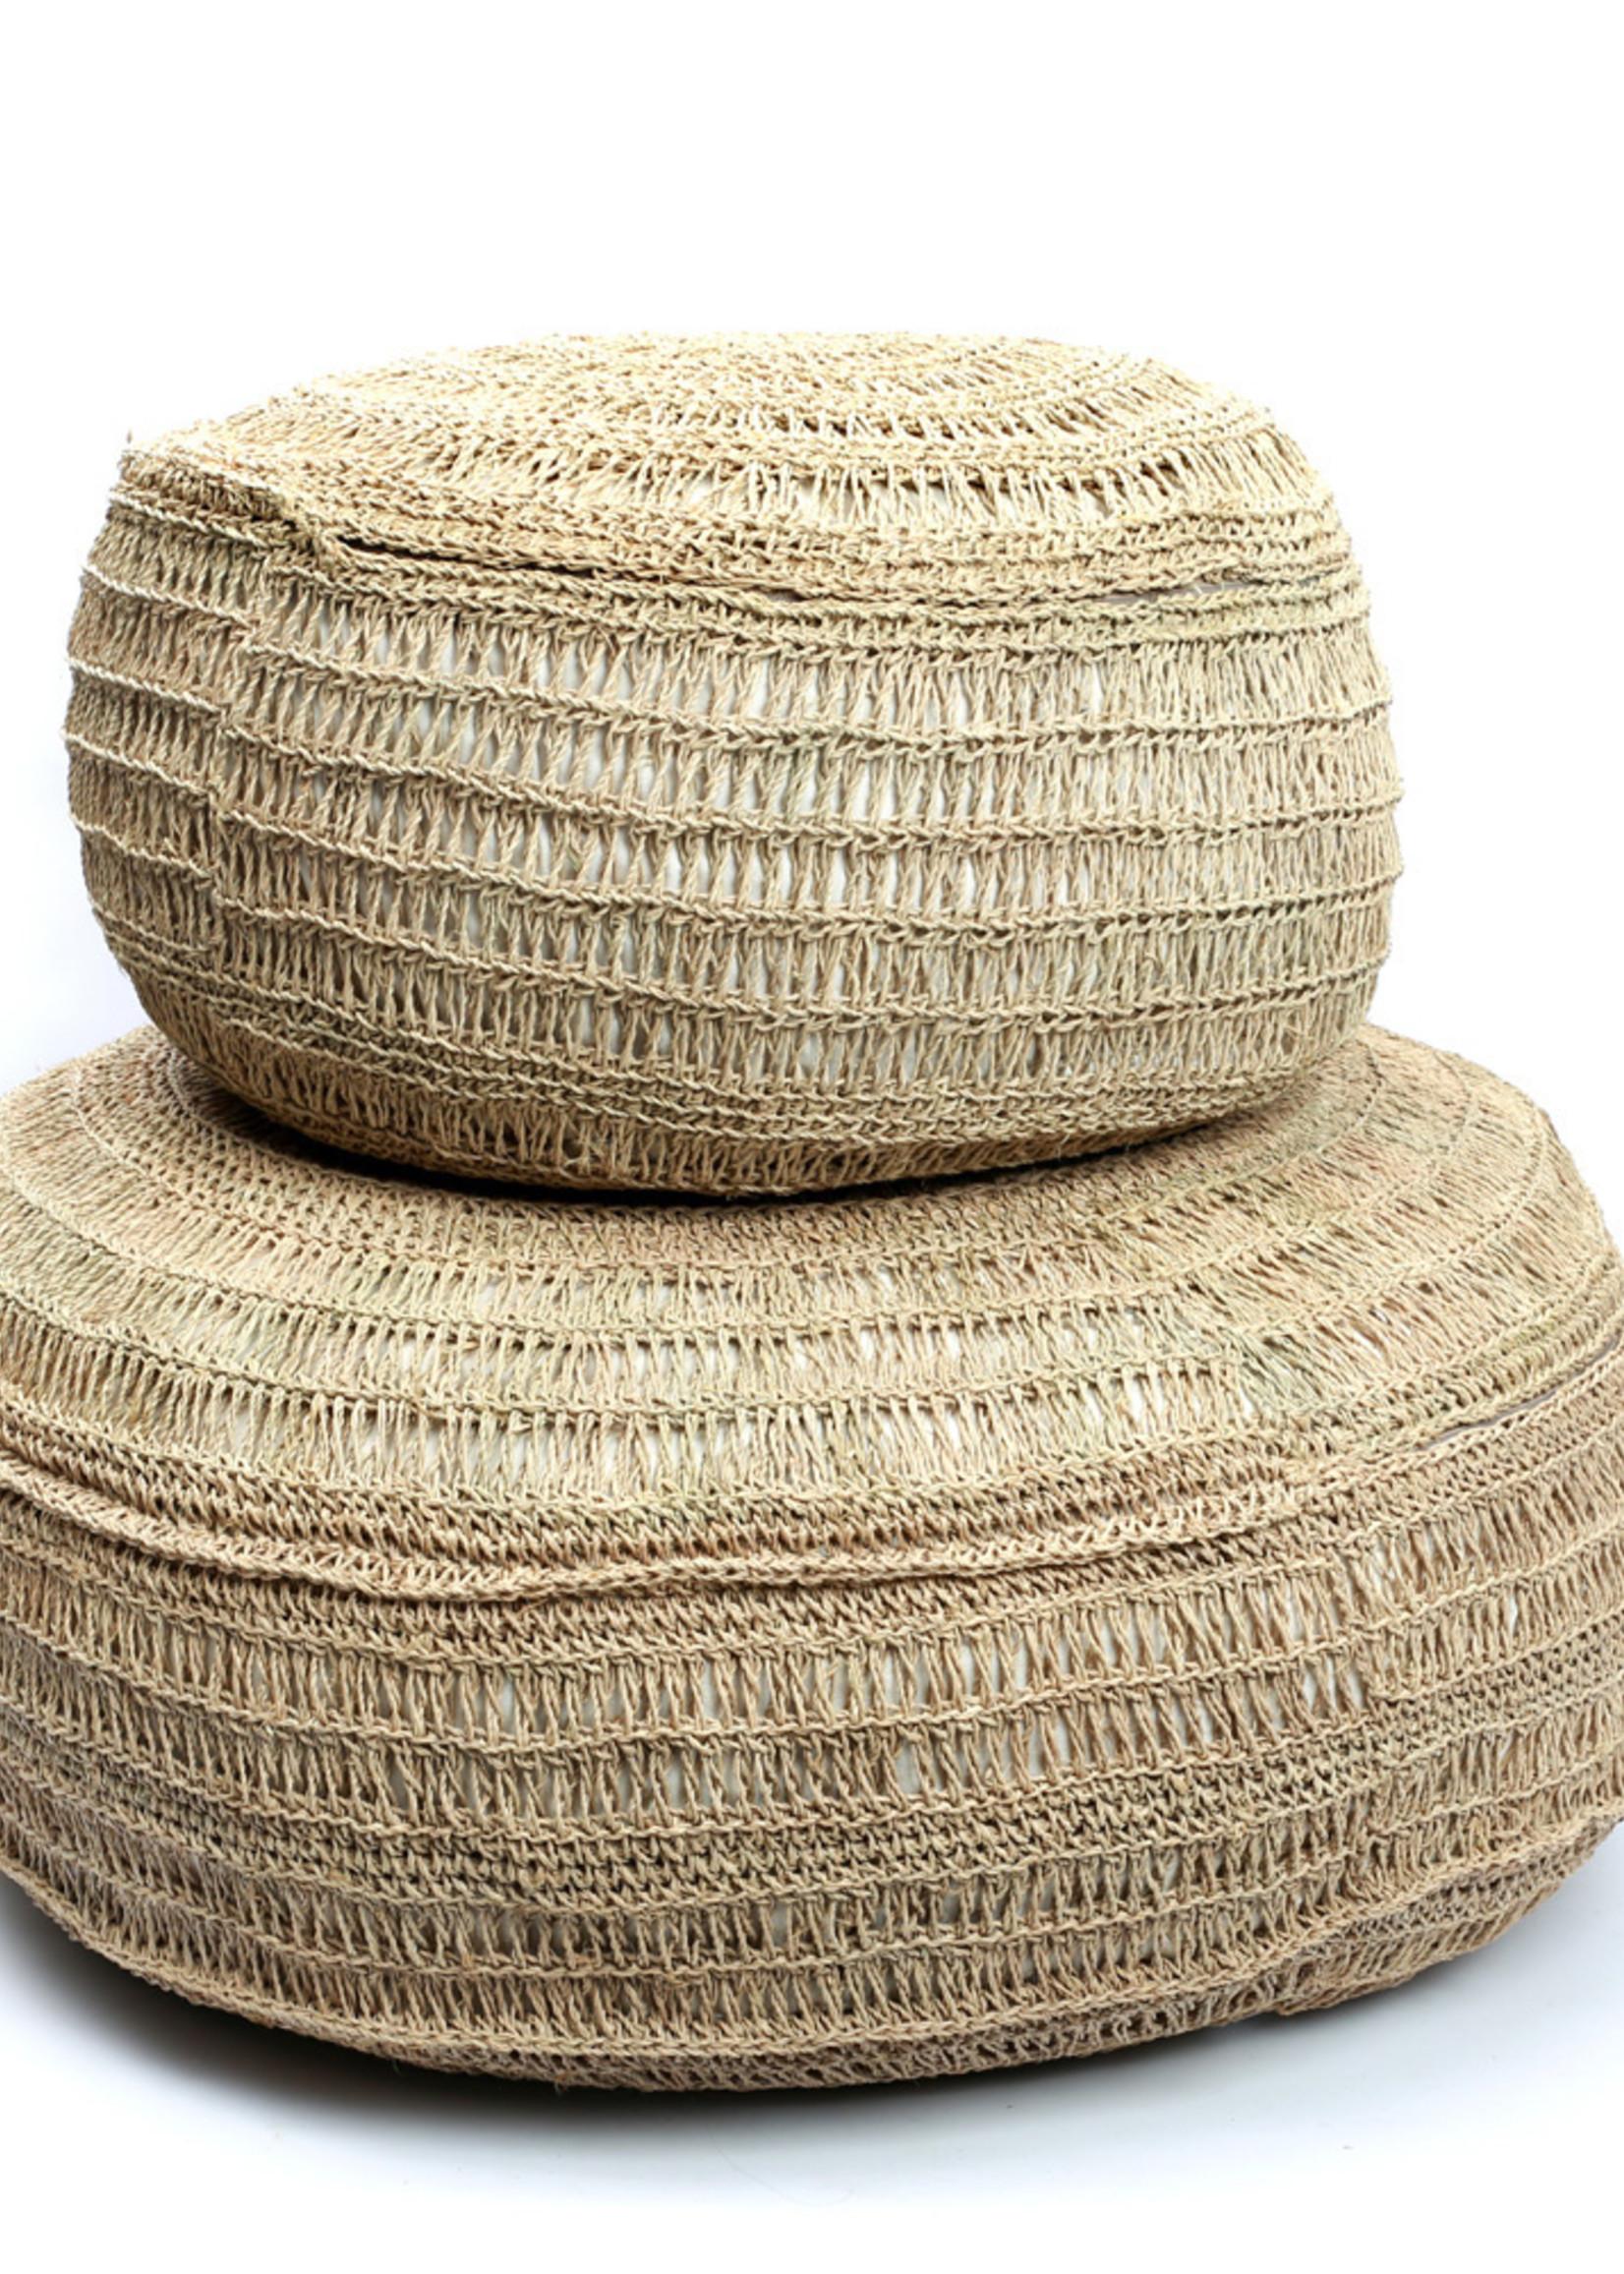 The Seagrass Pouffe - Natural - L